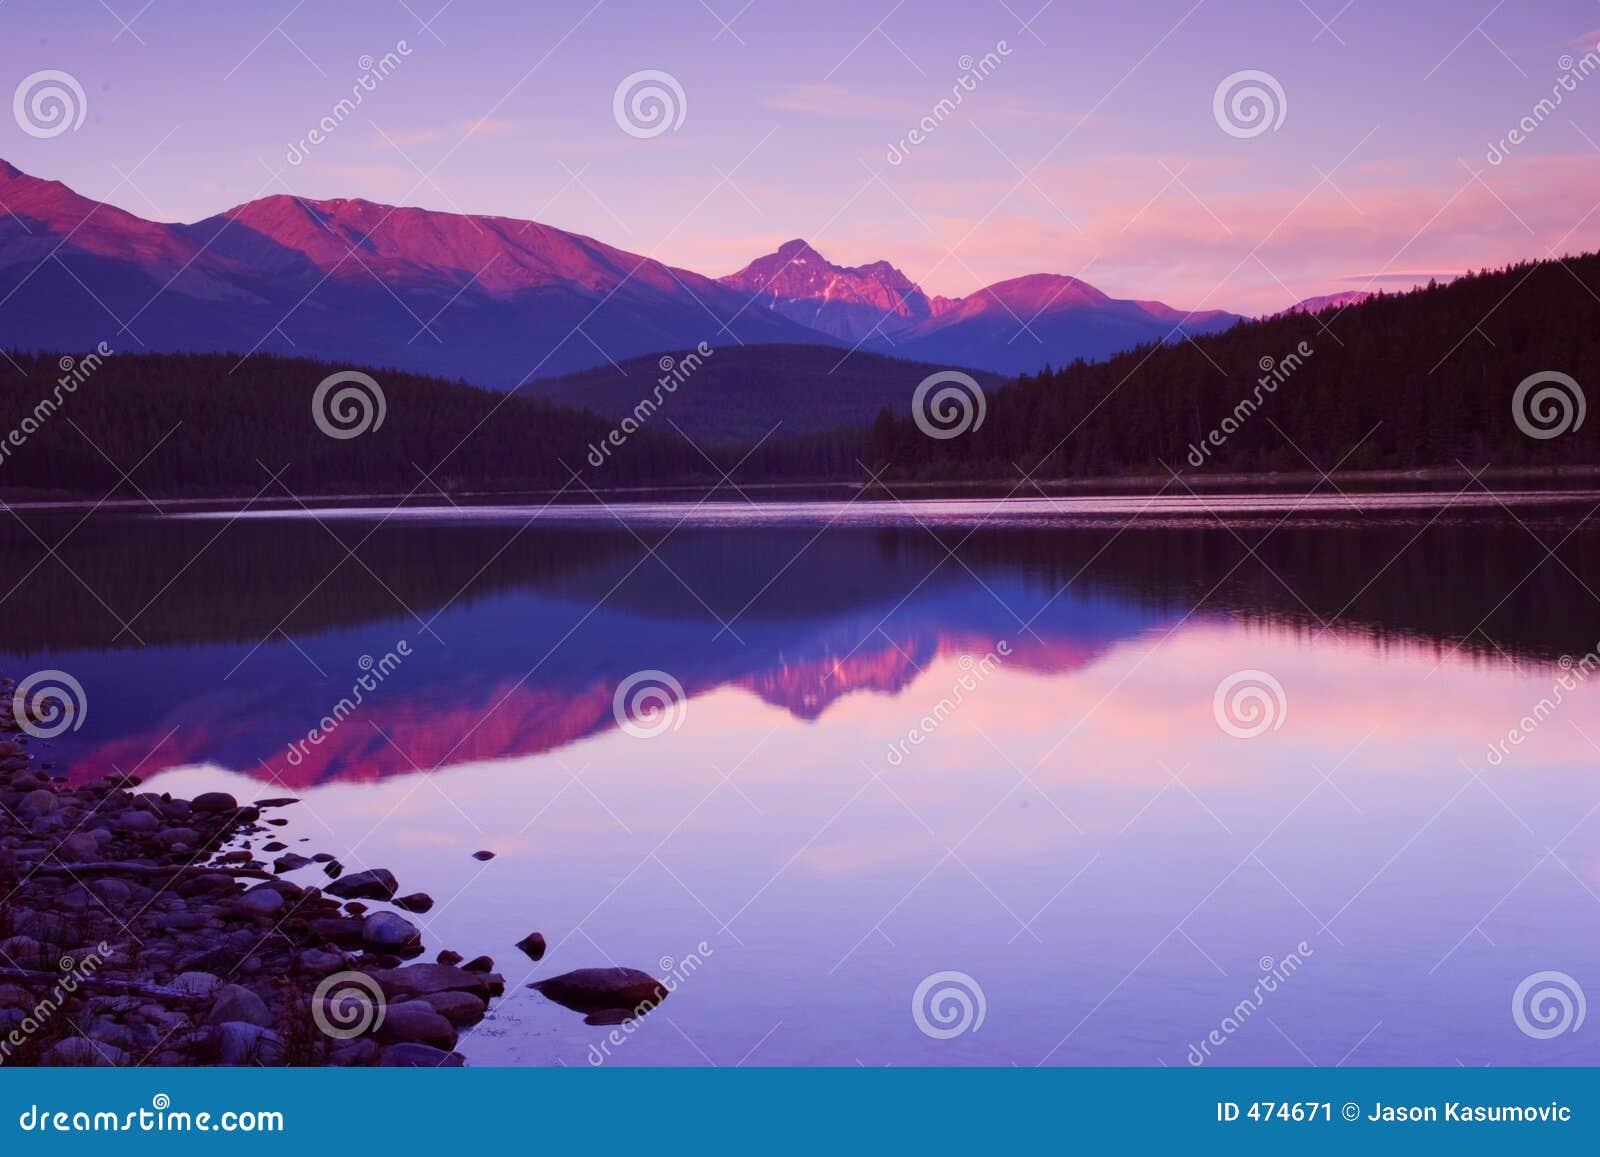 Download Magenta Skies stock image. Image of peaks, beautiful, trees - 474671